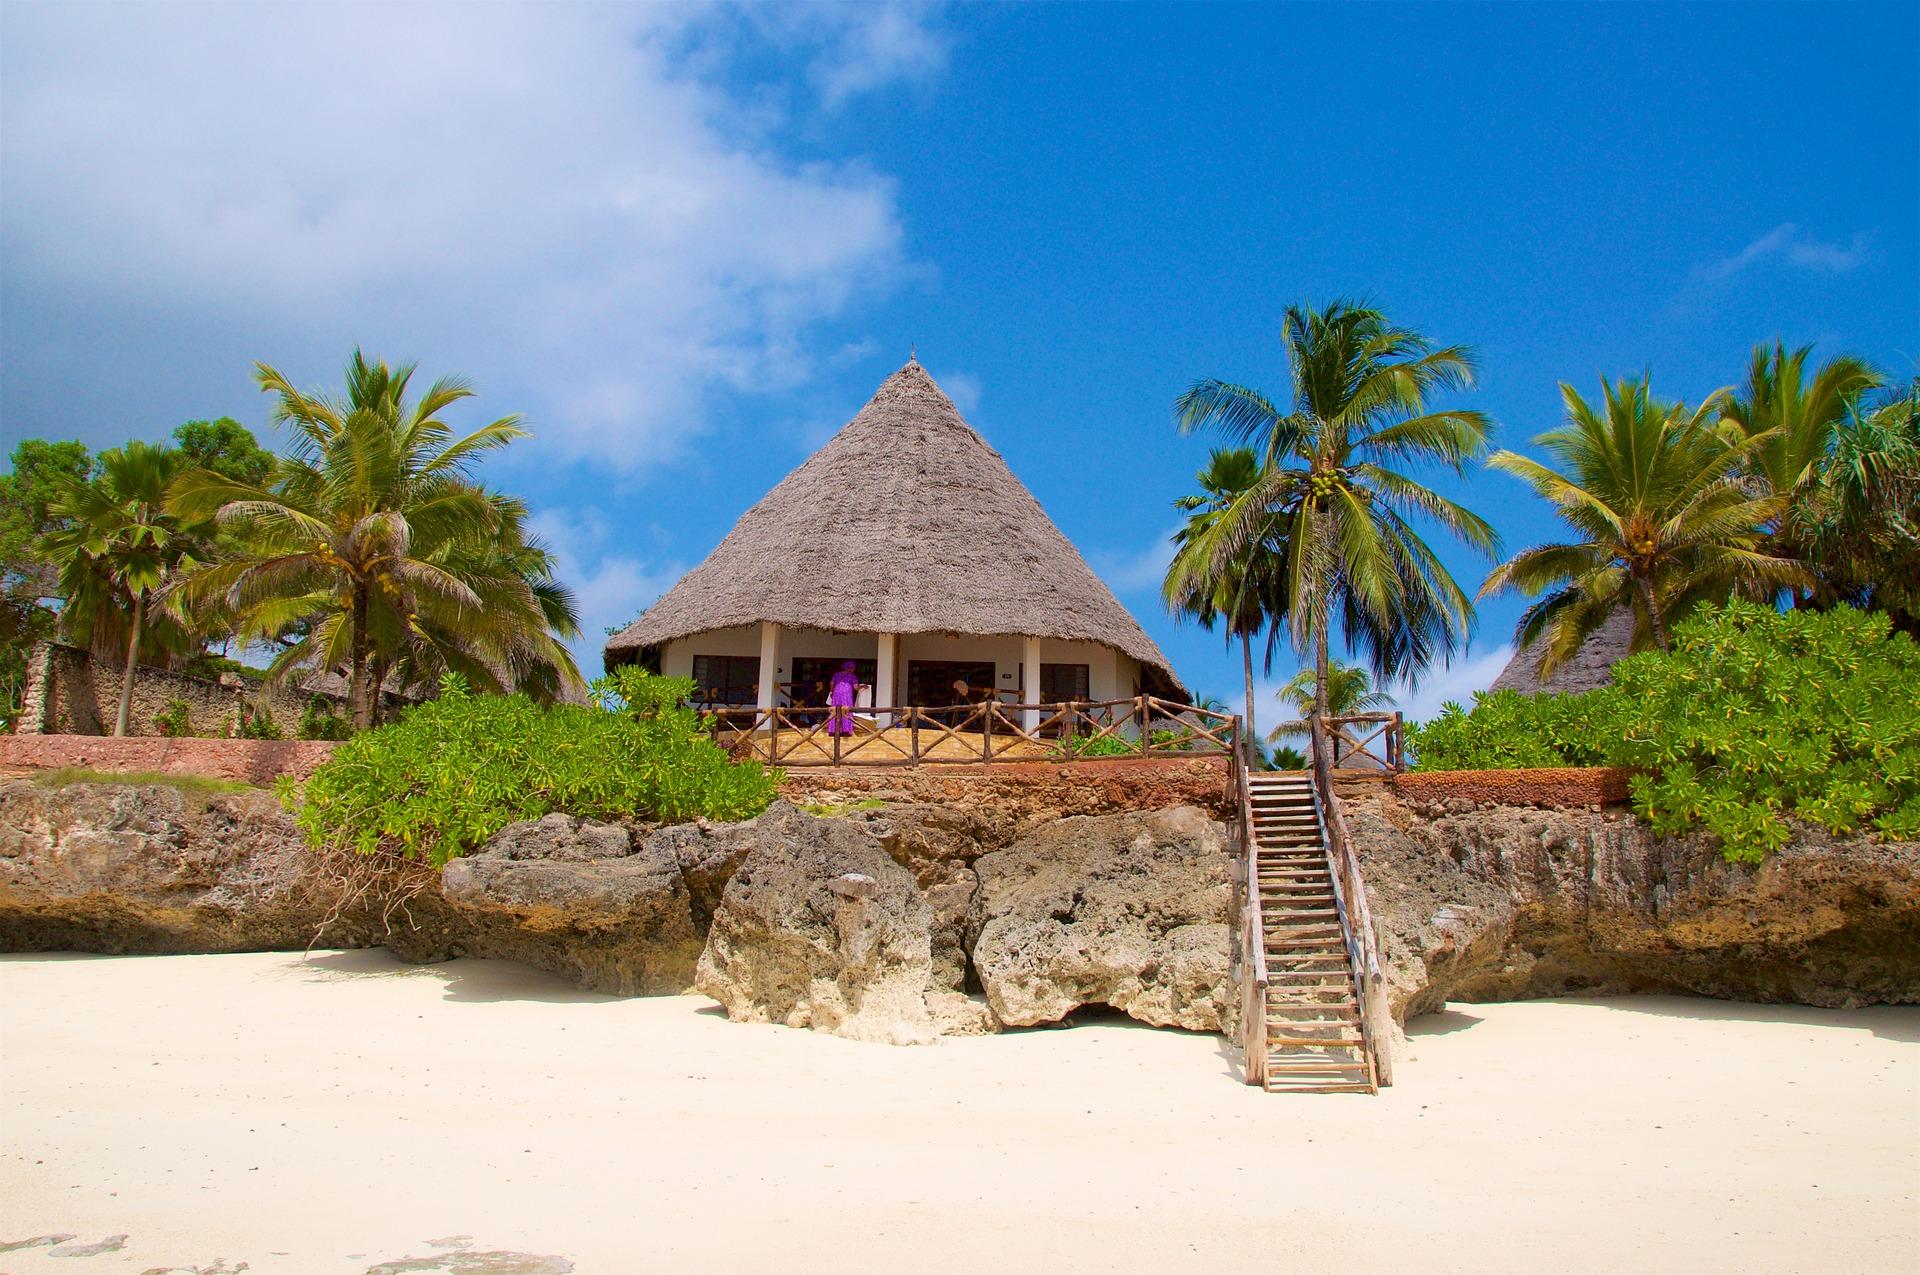 zanzibar-spiaggia-hotel-palme